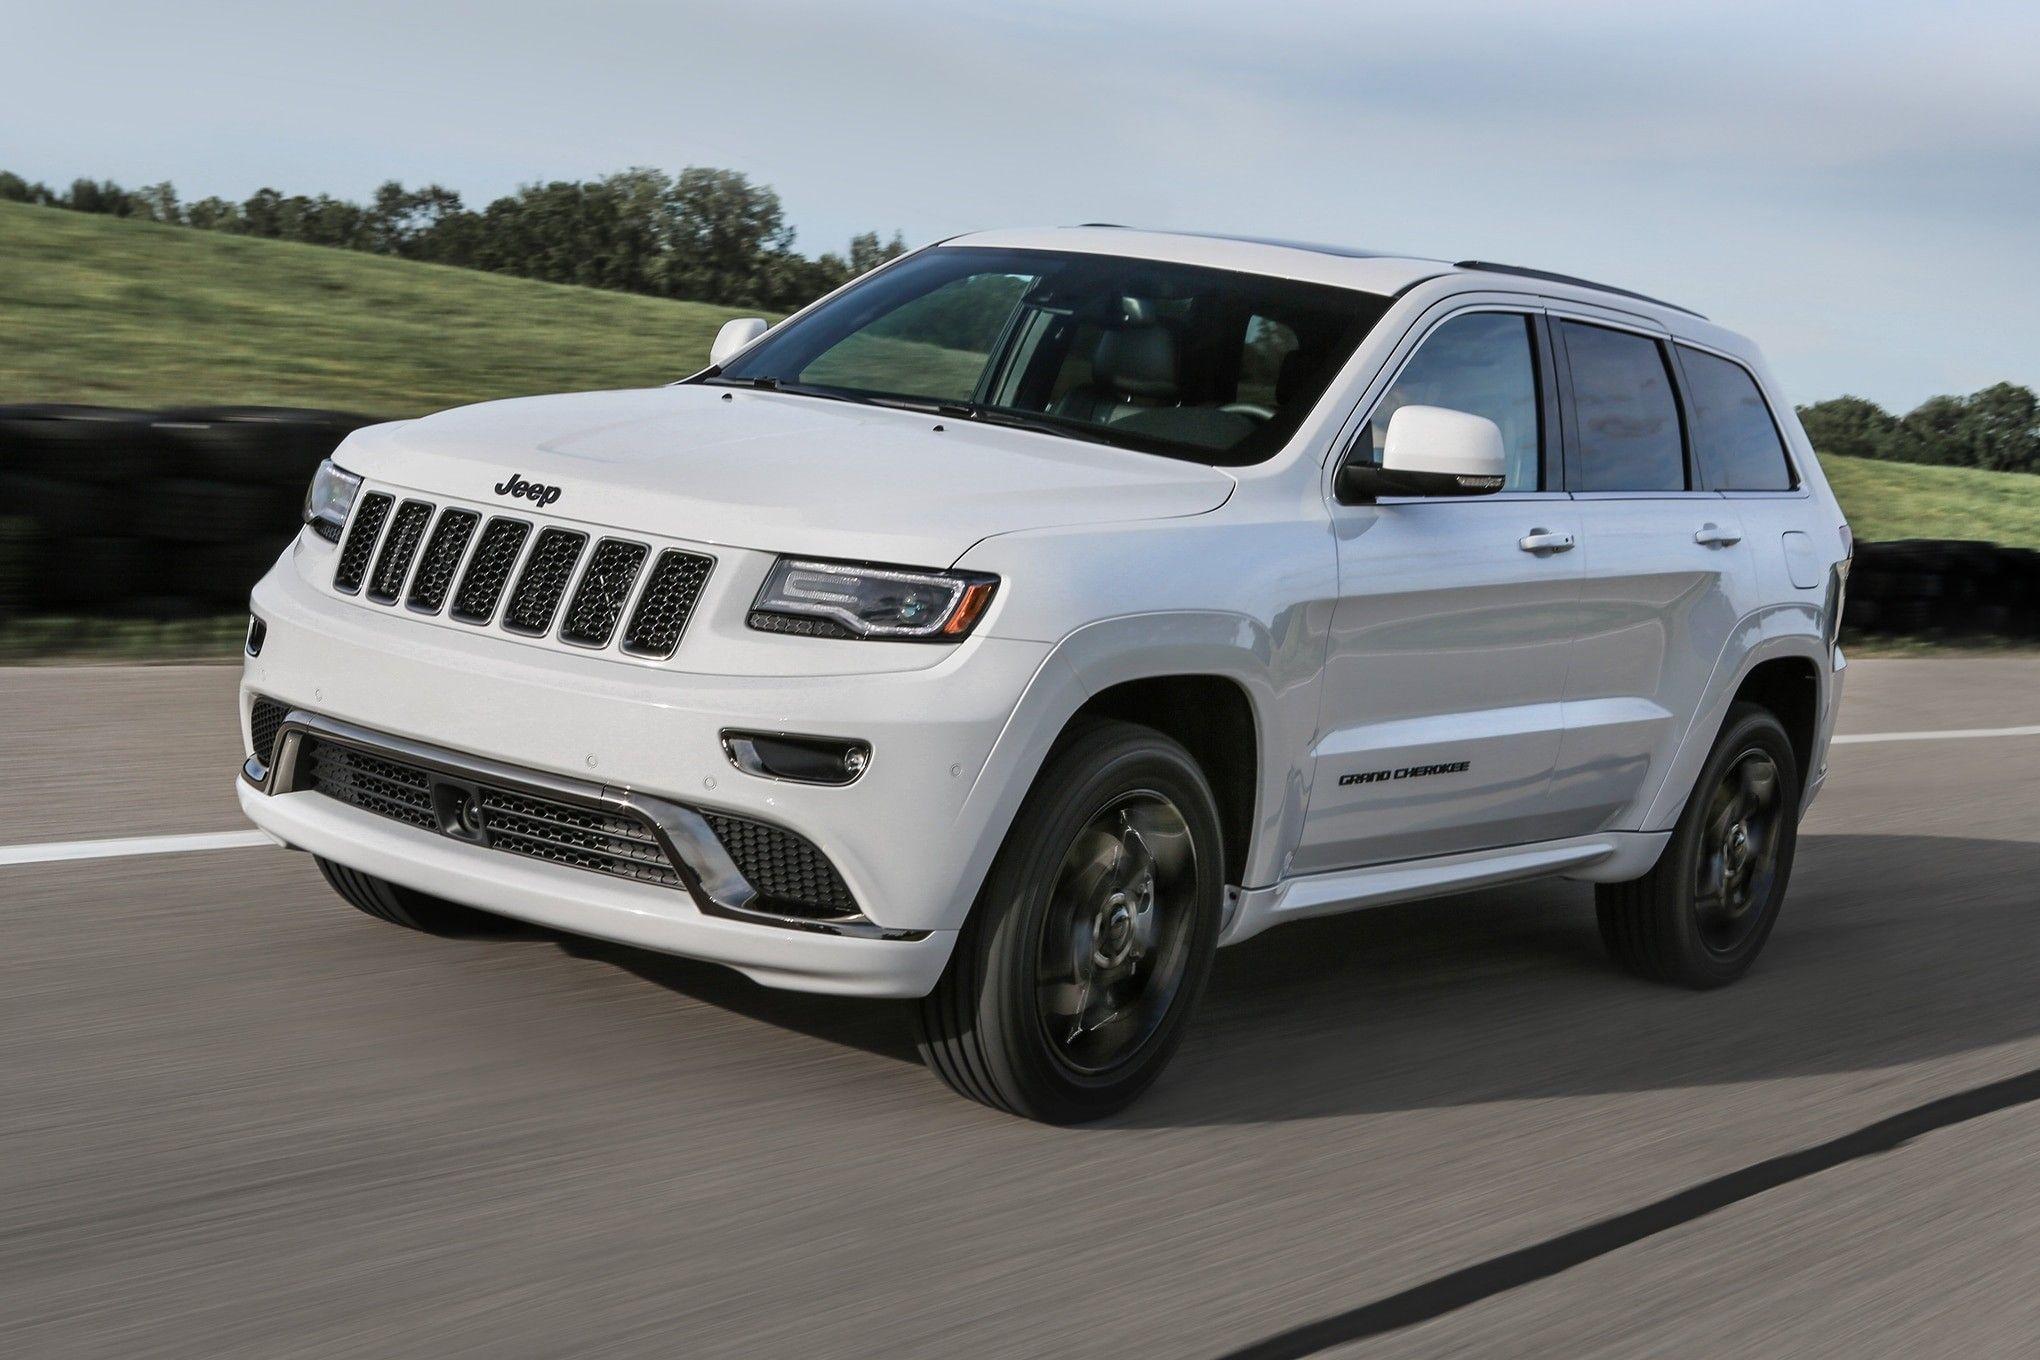 2019 Jeep Grand Cherokee Mpg Price Jeep Grand Cherokee Jeep Grand Jeep